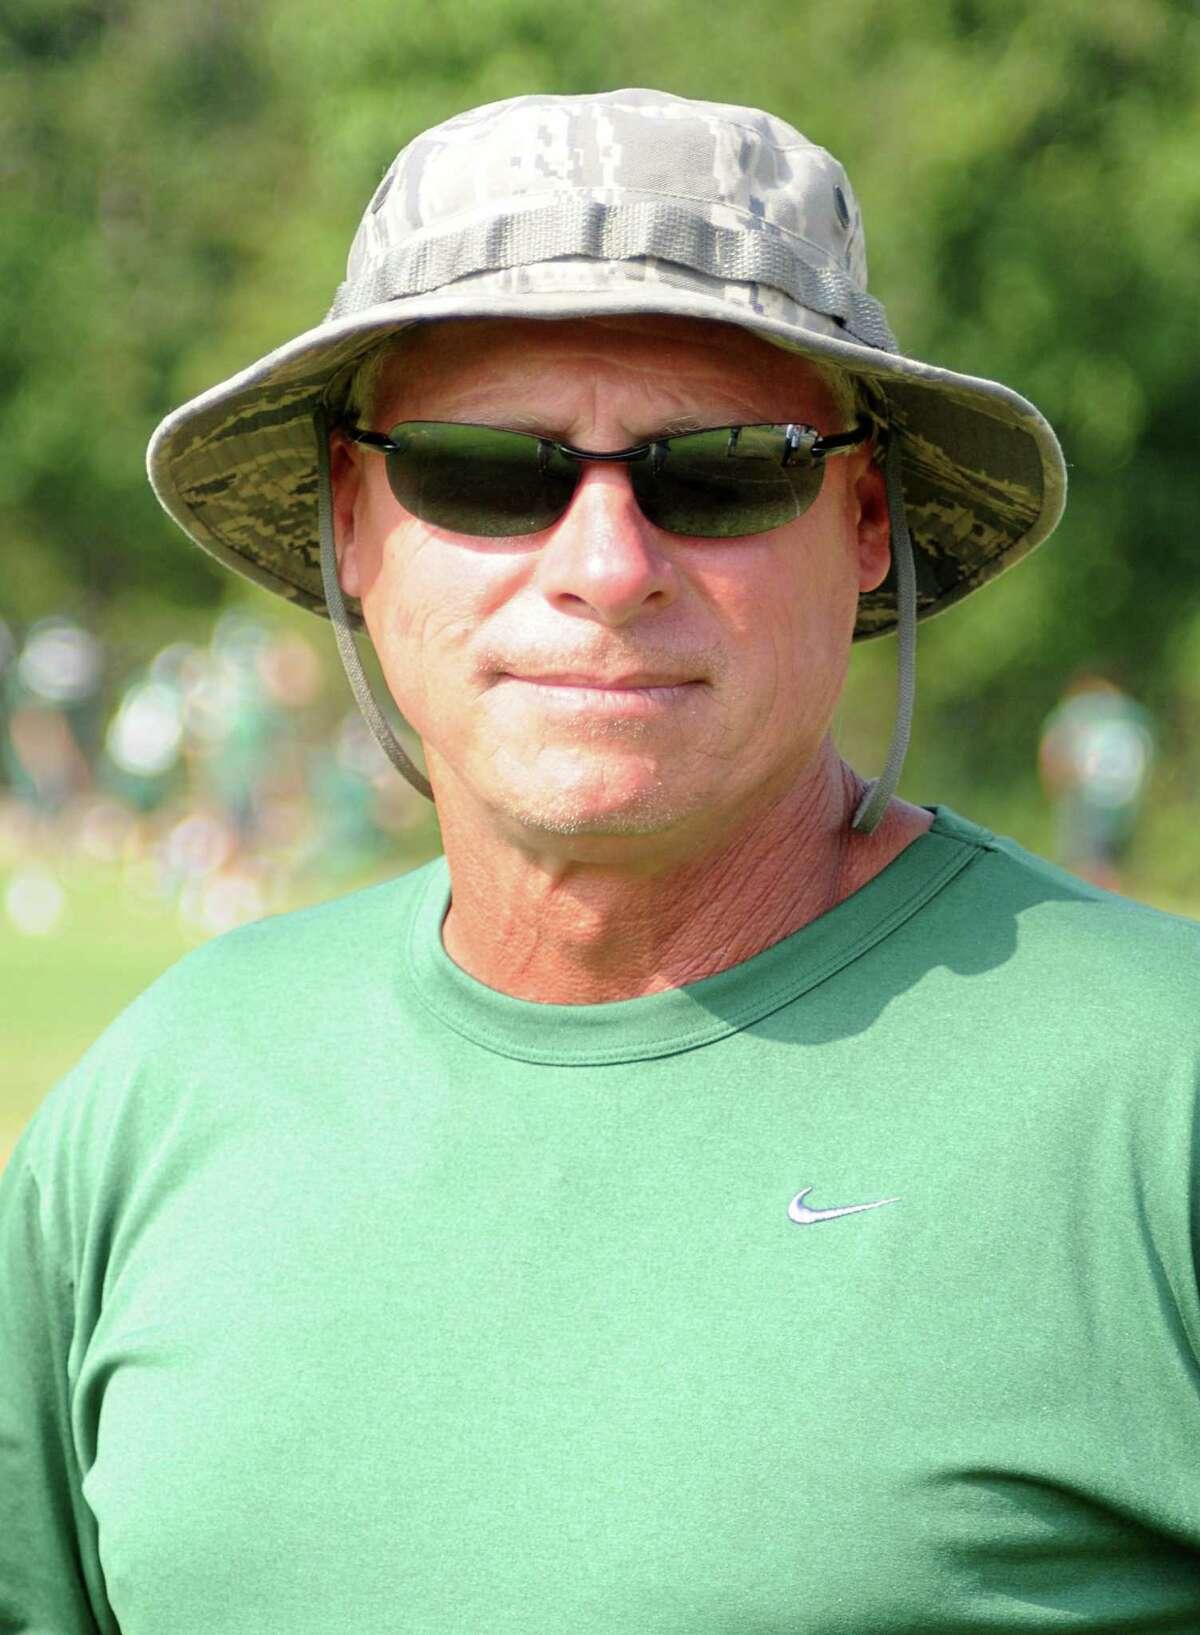 Football coach Mark Schmid during The Woodlands High School football practice. Photograph by David Hopper